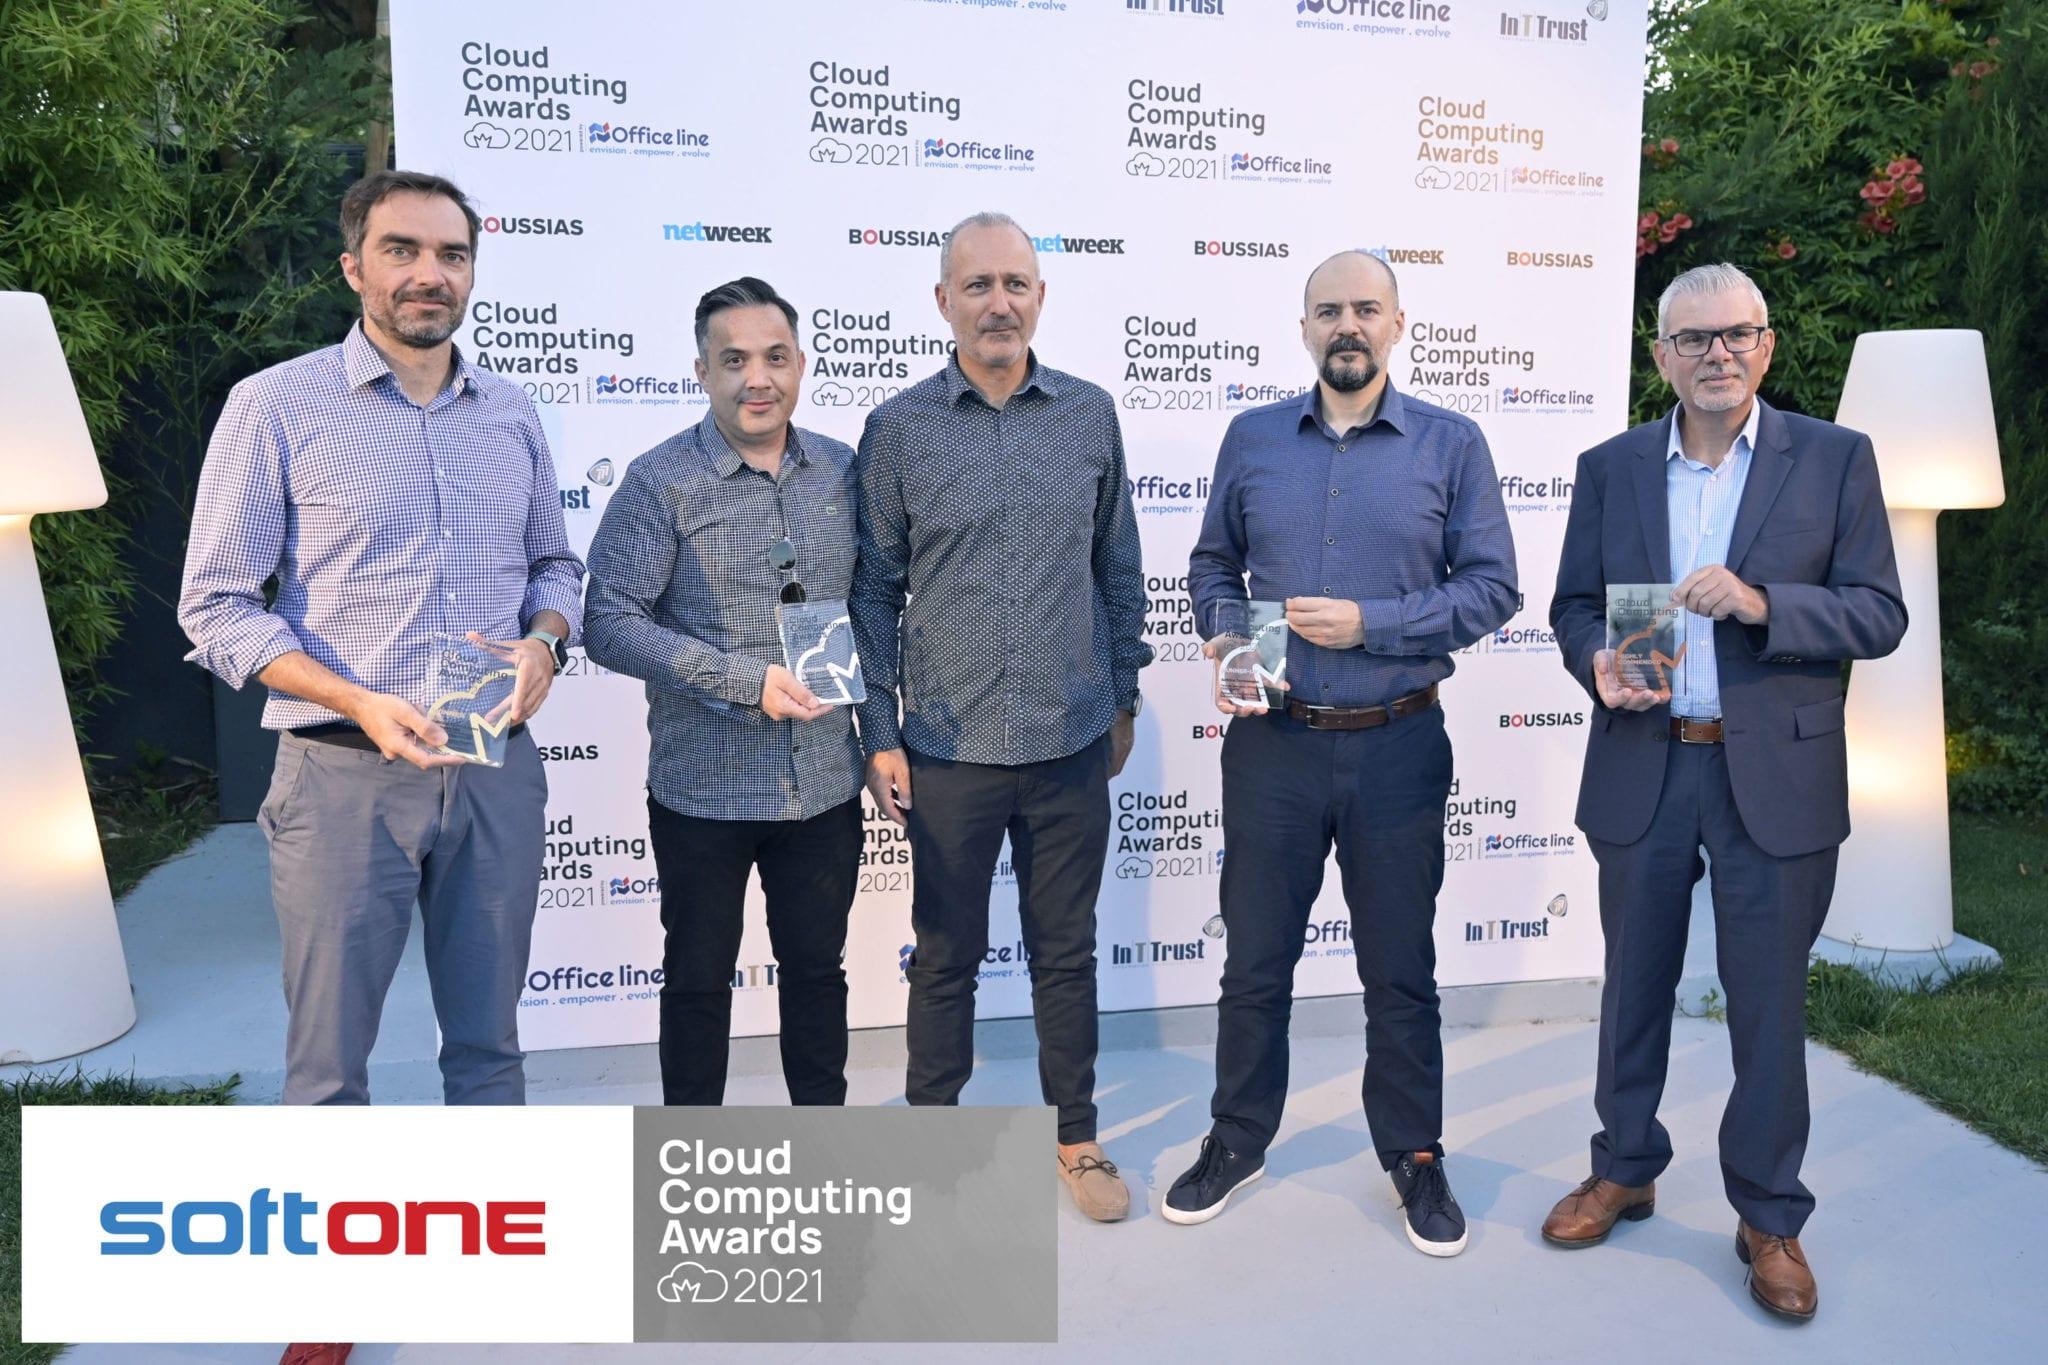 Softone Cloud Computing Awards 2021